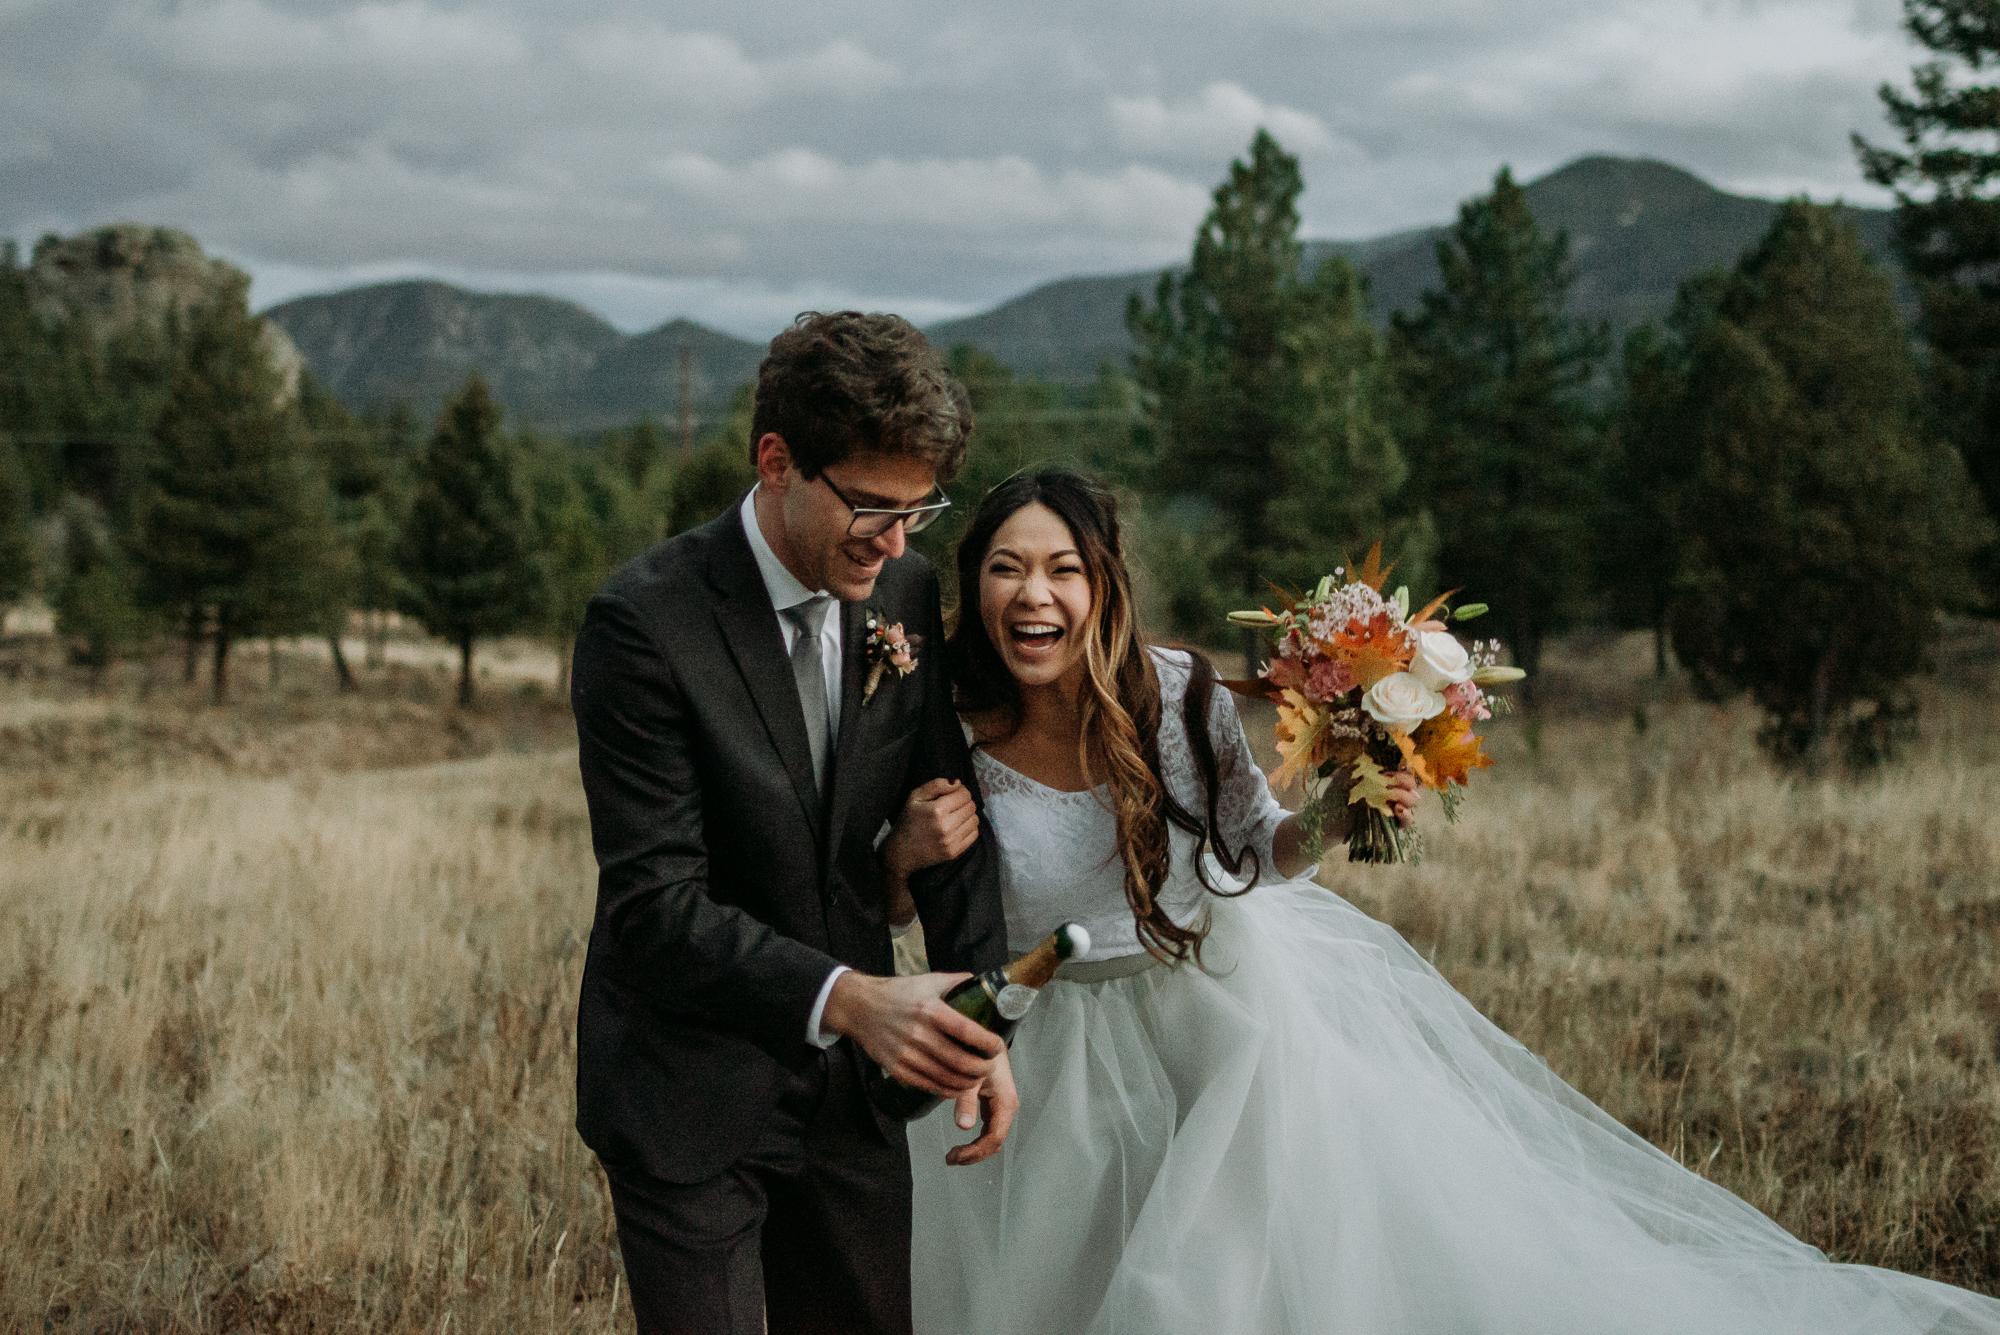 wild_earth_weddings_colorado_elopement_photographer_dogs_rocky_mountains-45.jpg